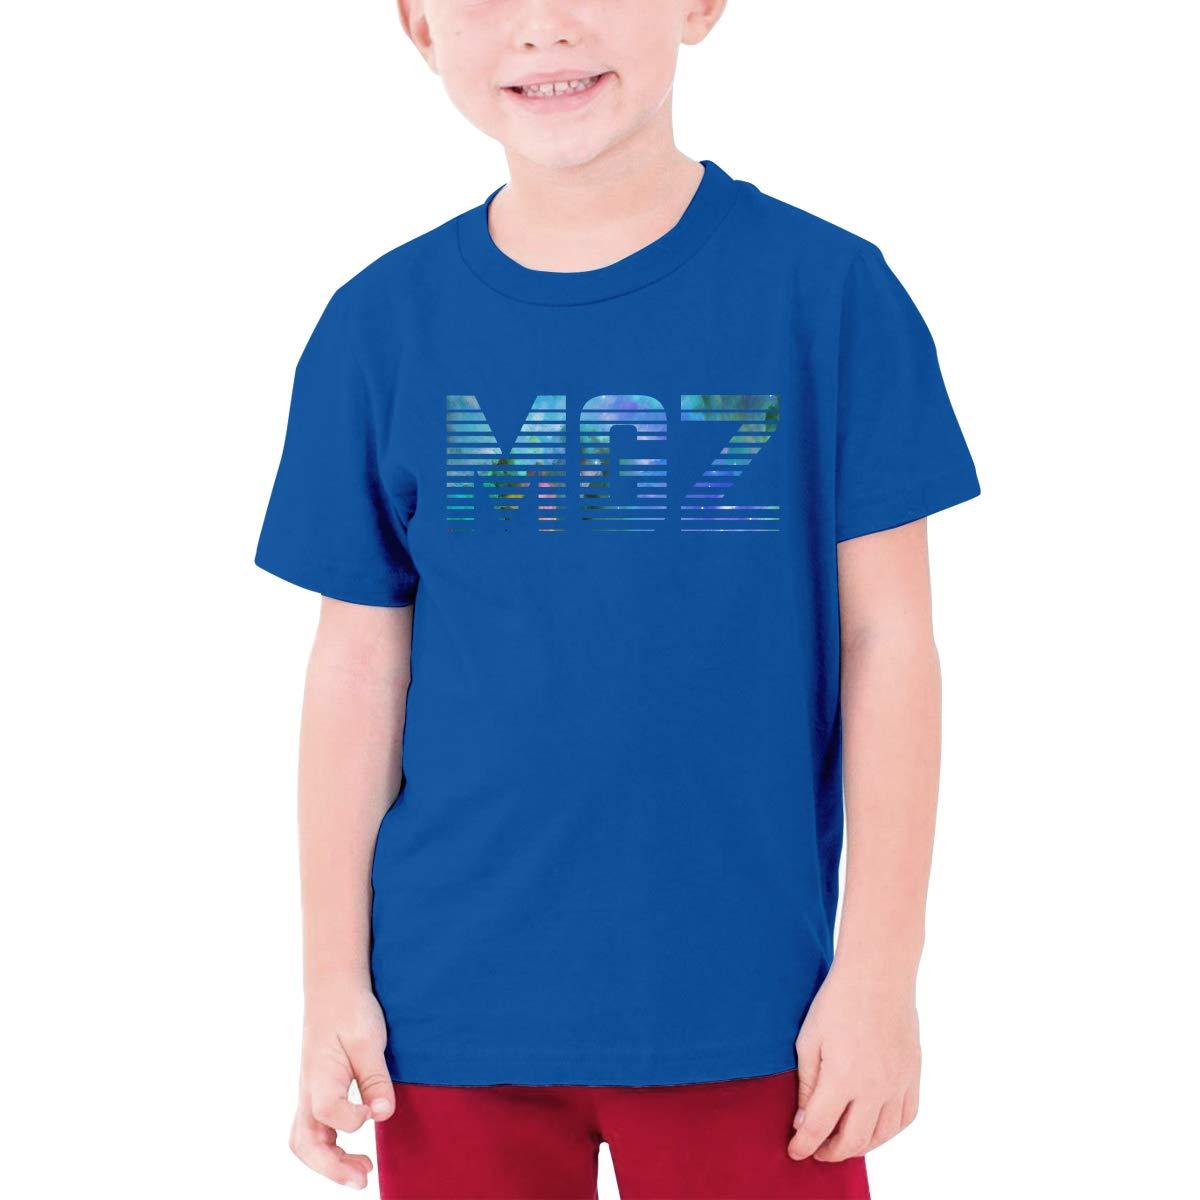 Brocade Carp Morgz Youtuber Mgz Teens Sport Shirt For Teen Teens Black